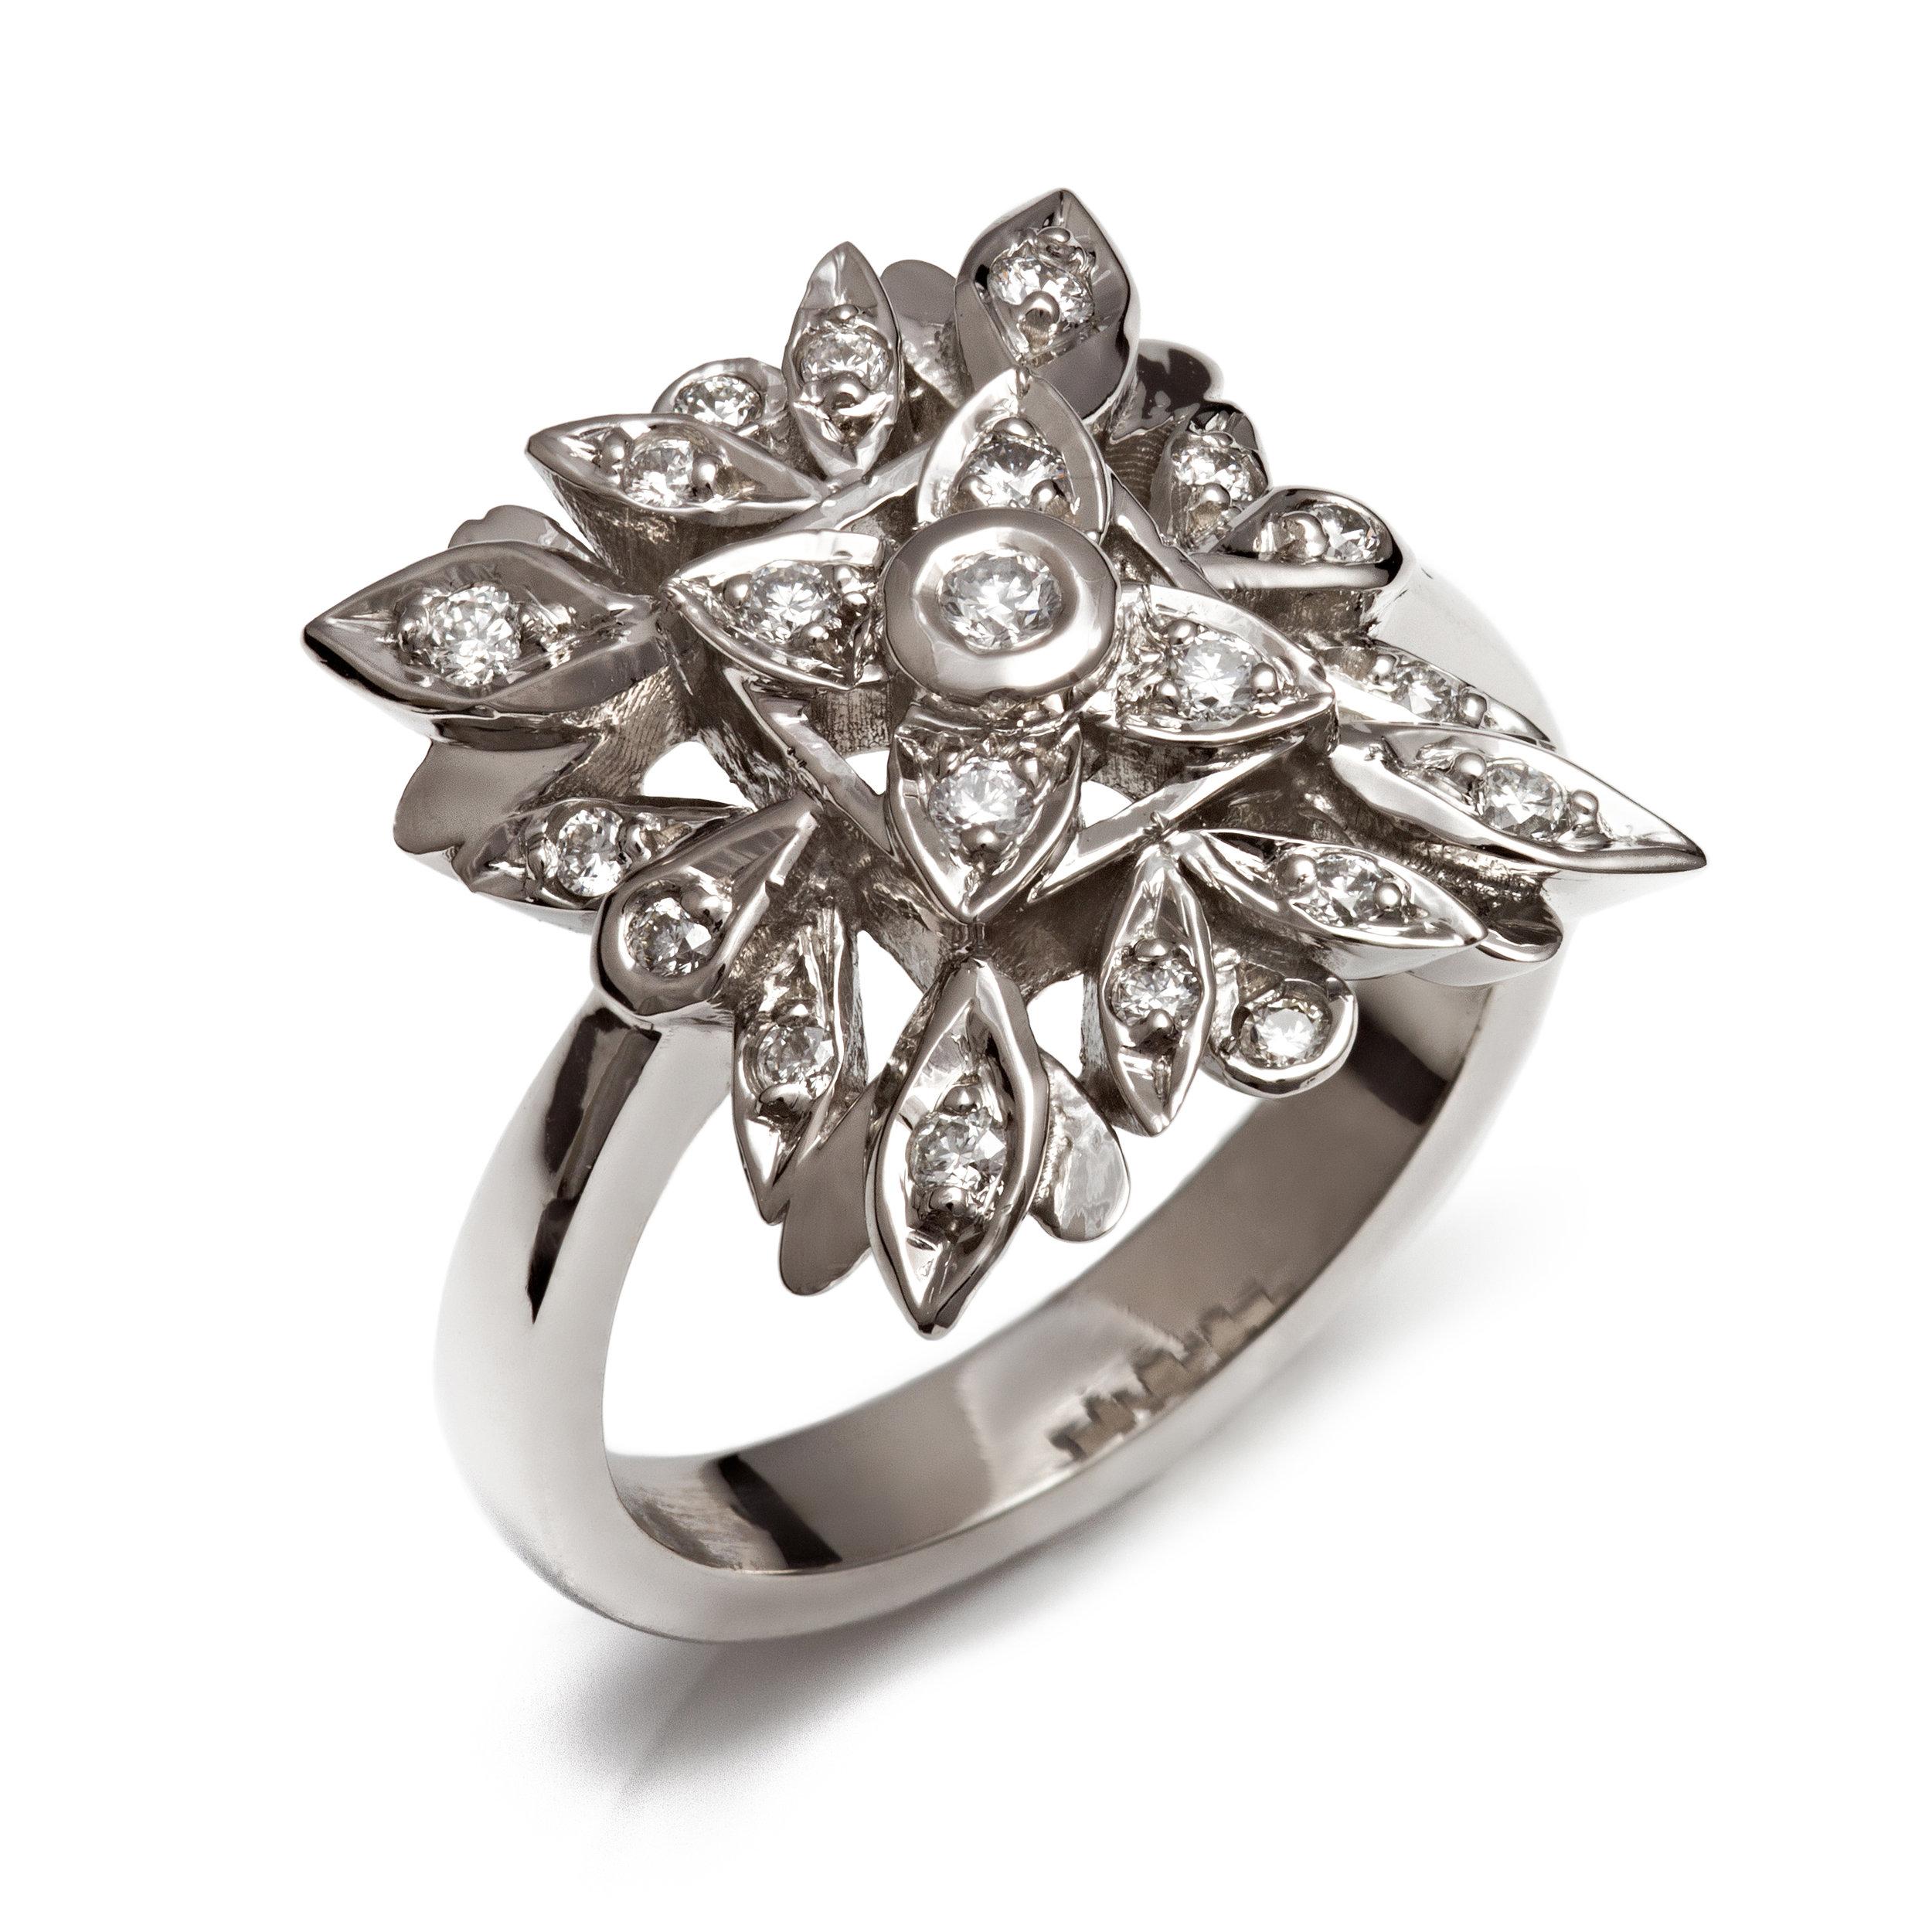 Bespoke palladium and diamond ring commission